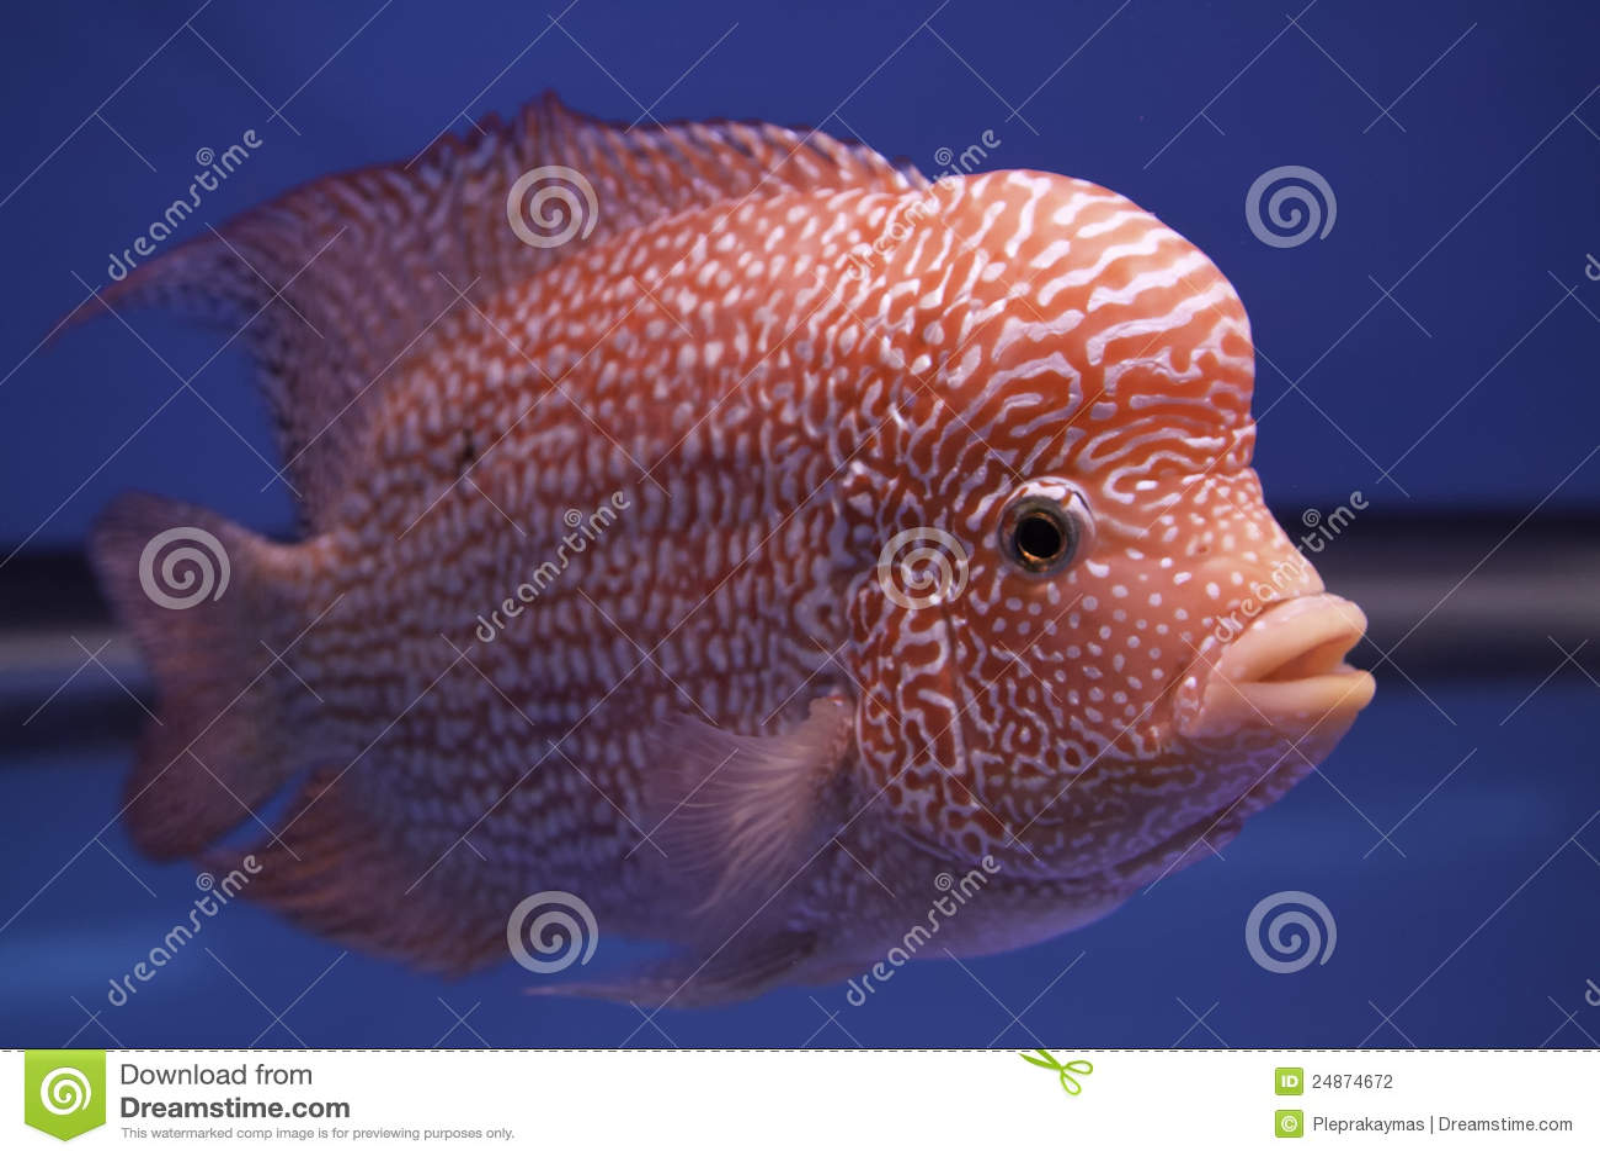 Aquarium Fish Flower Horn Fish Stock graphy Image